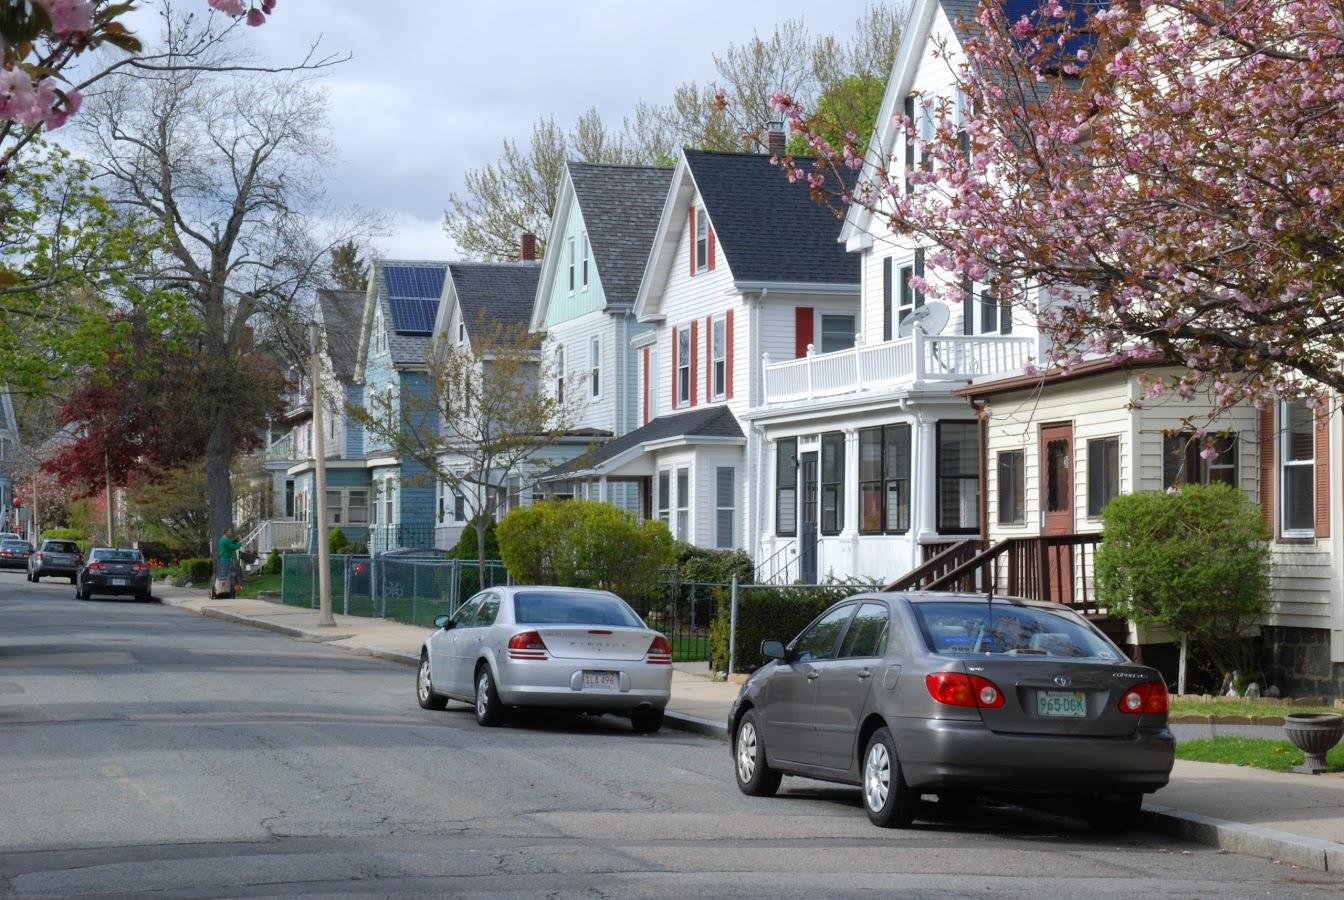 Save money and reduce energy | Boston.gov